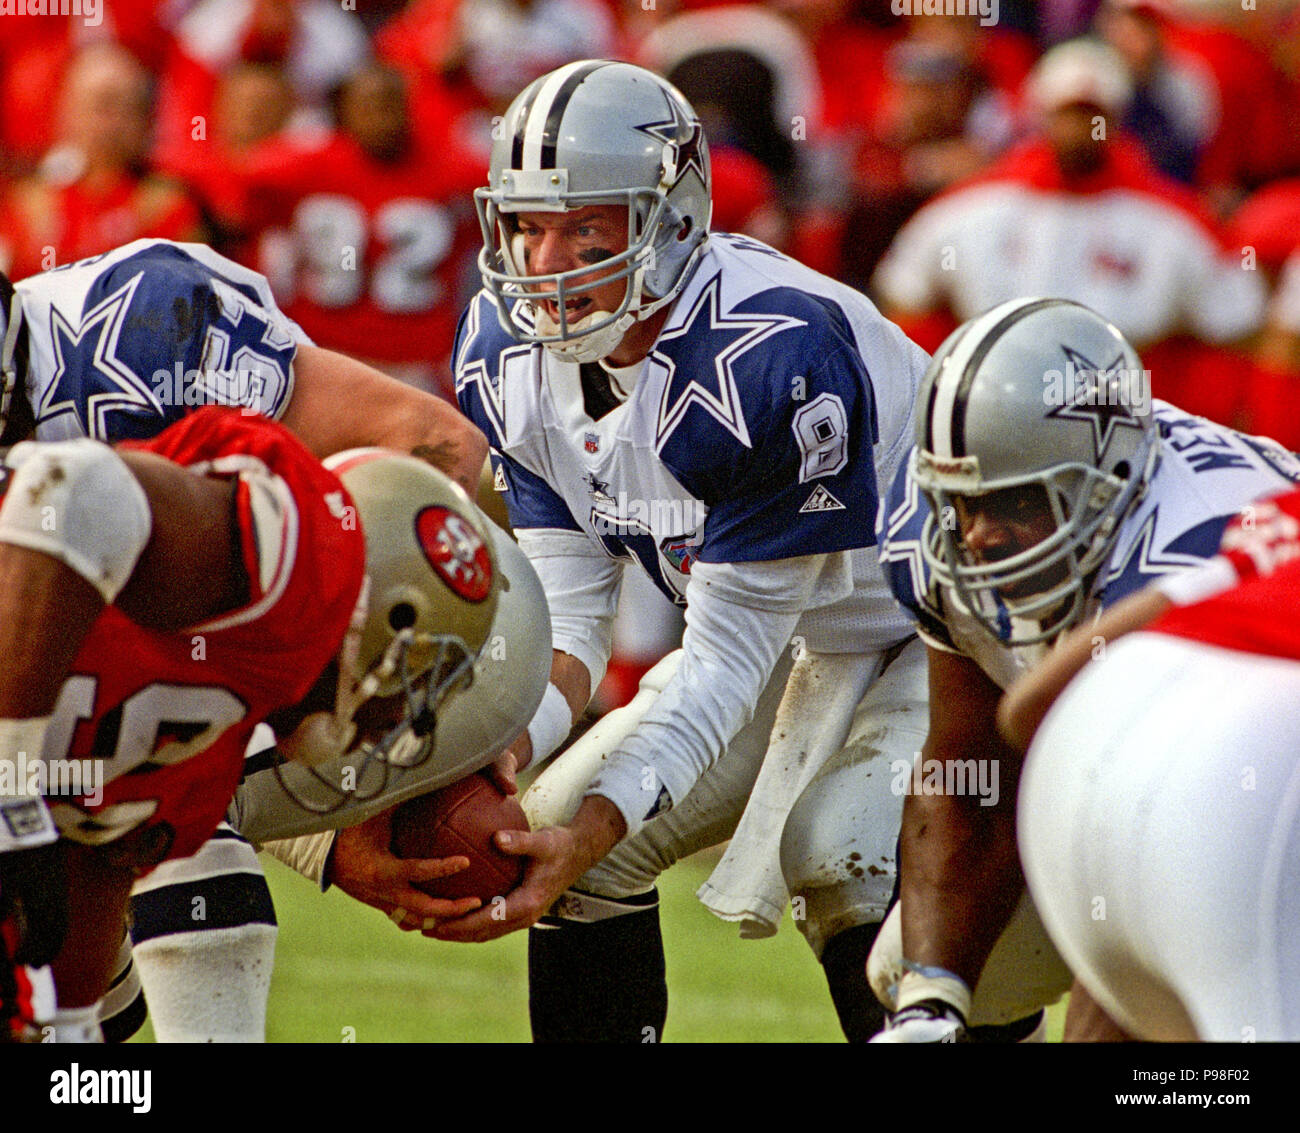 c818041588a January 15, 1995 - San Francisco, California, U.S - San Francisco 49ers vs. Dallas  Cowboys at Candlestick Park Sunday, January 15, 1995.